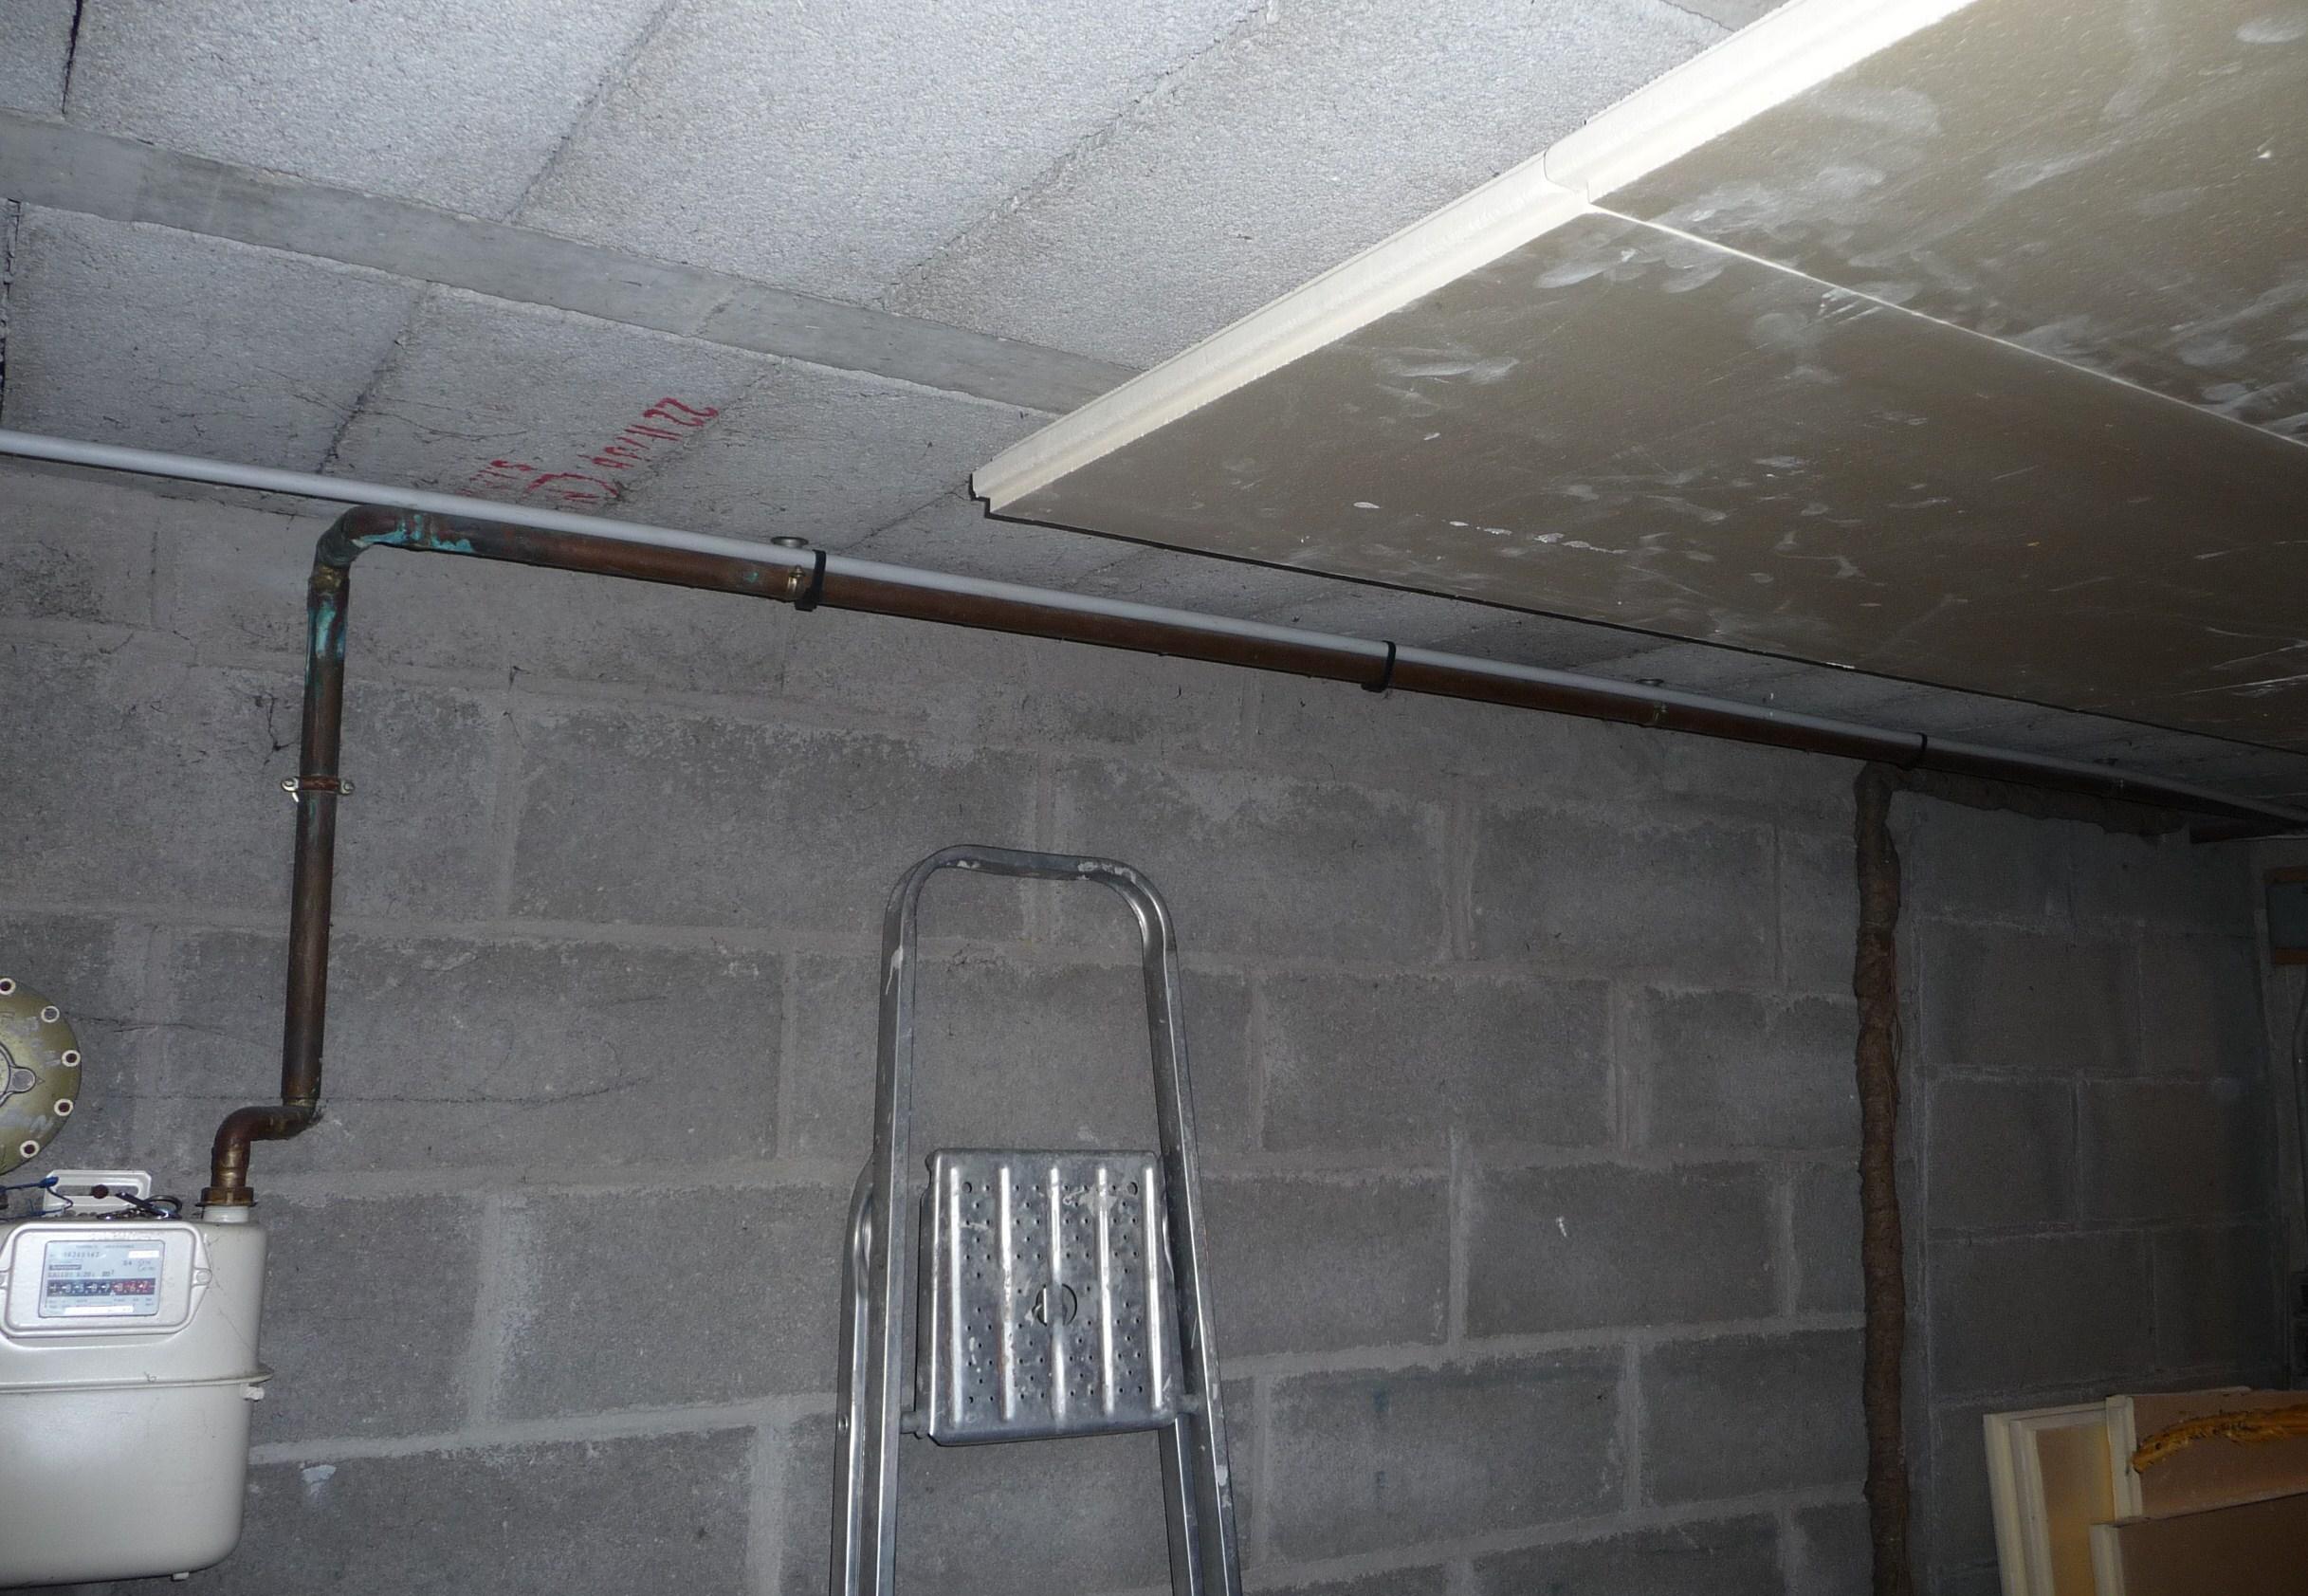 Comment cacher tuyau au plafond for Cache tuyau salle de bain